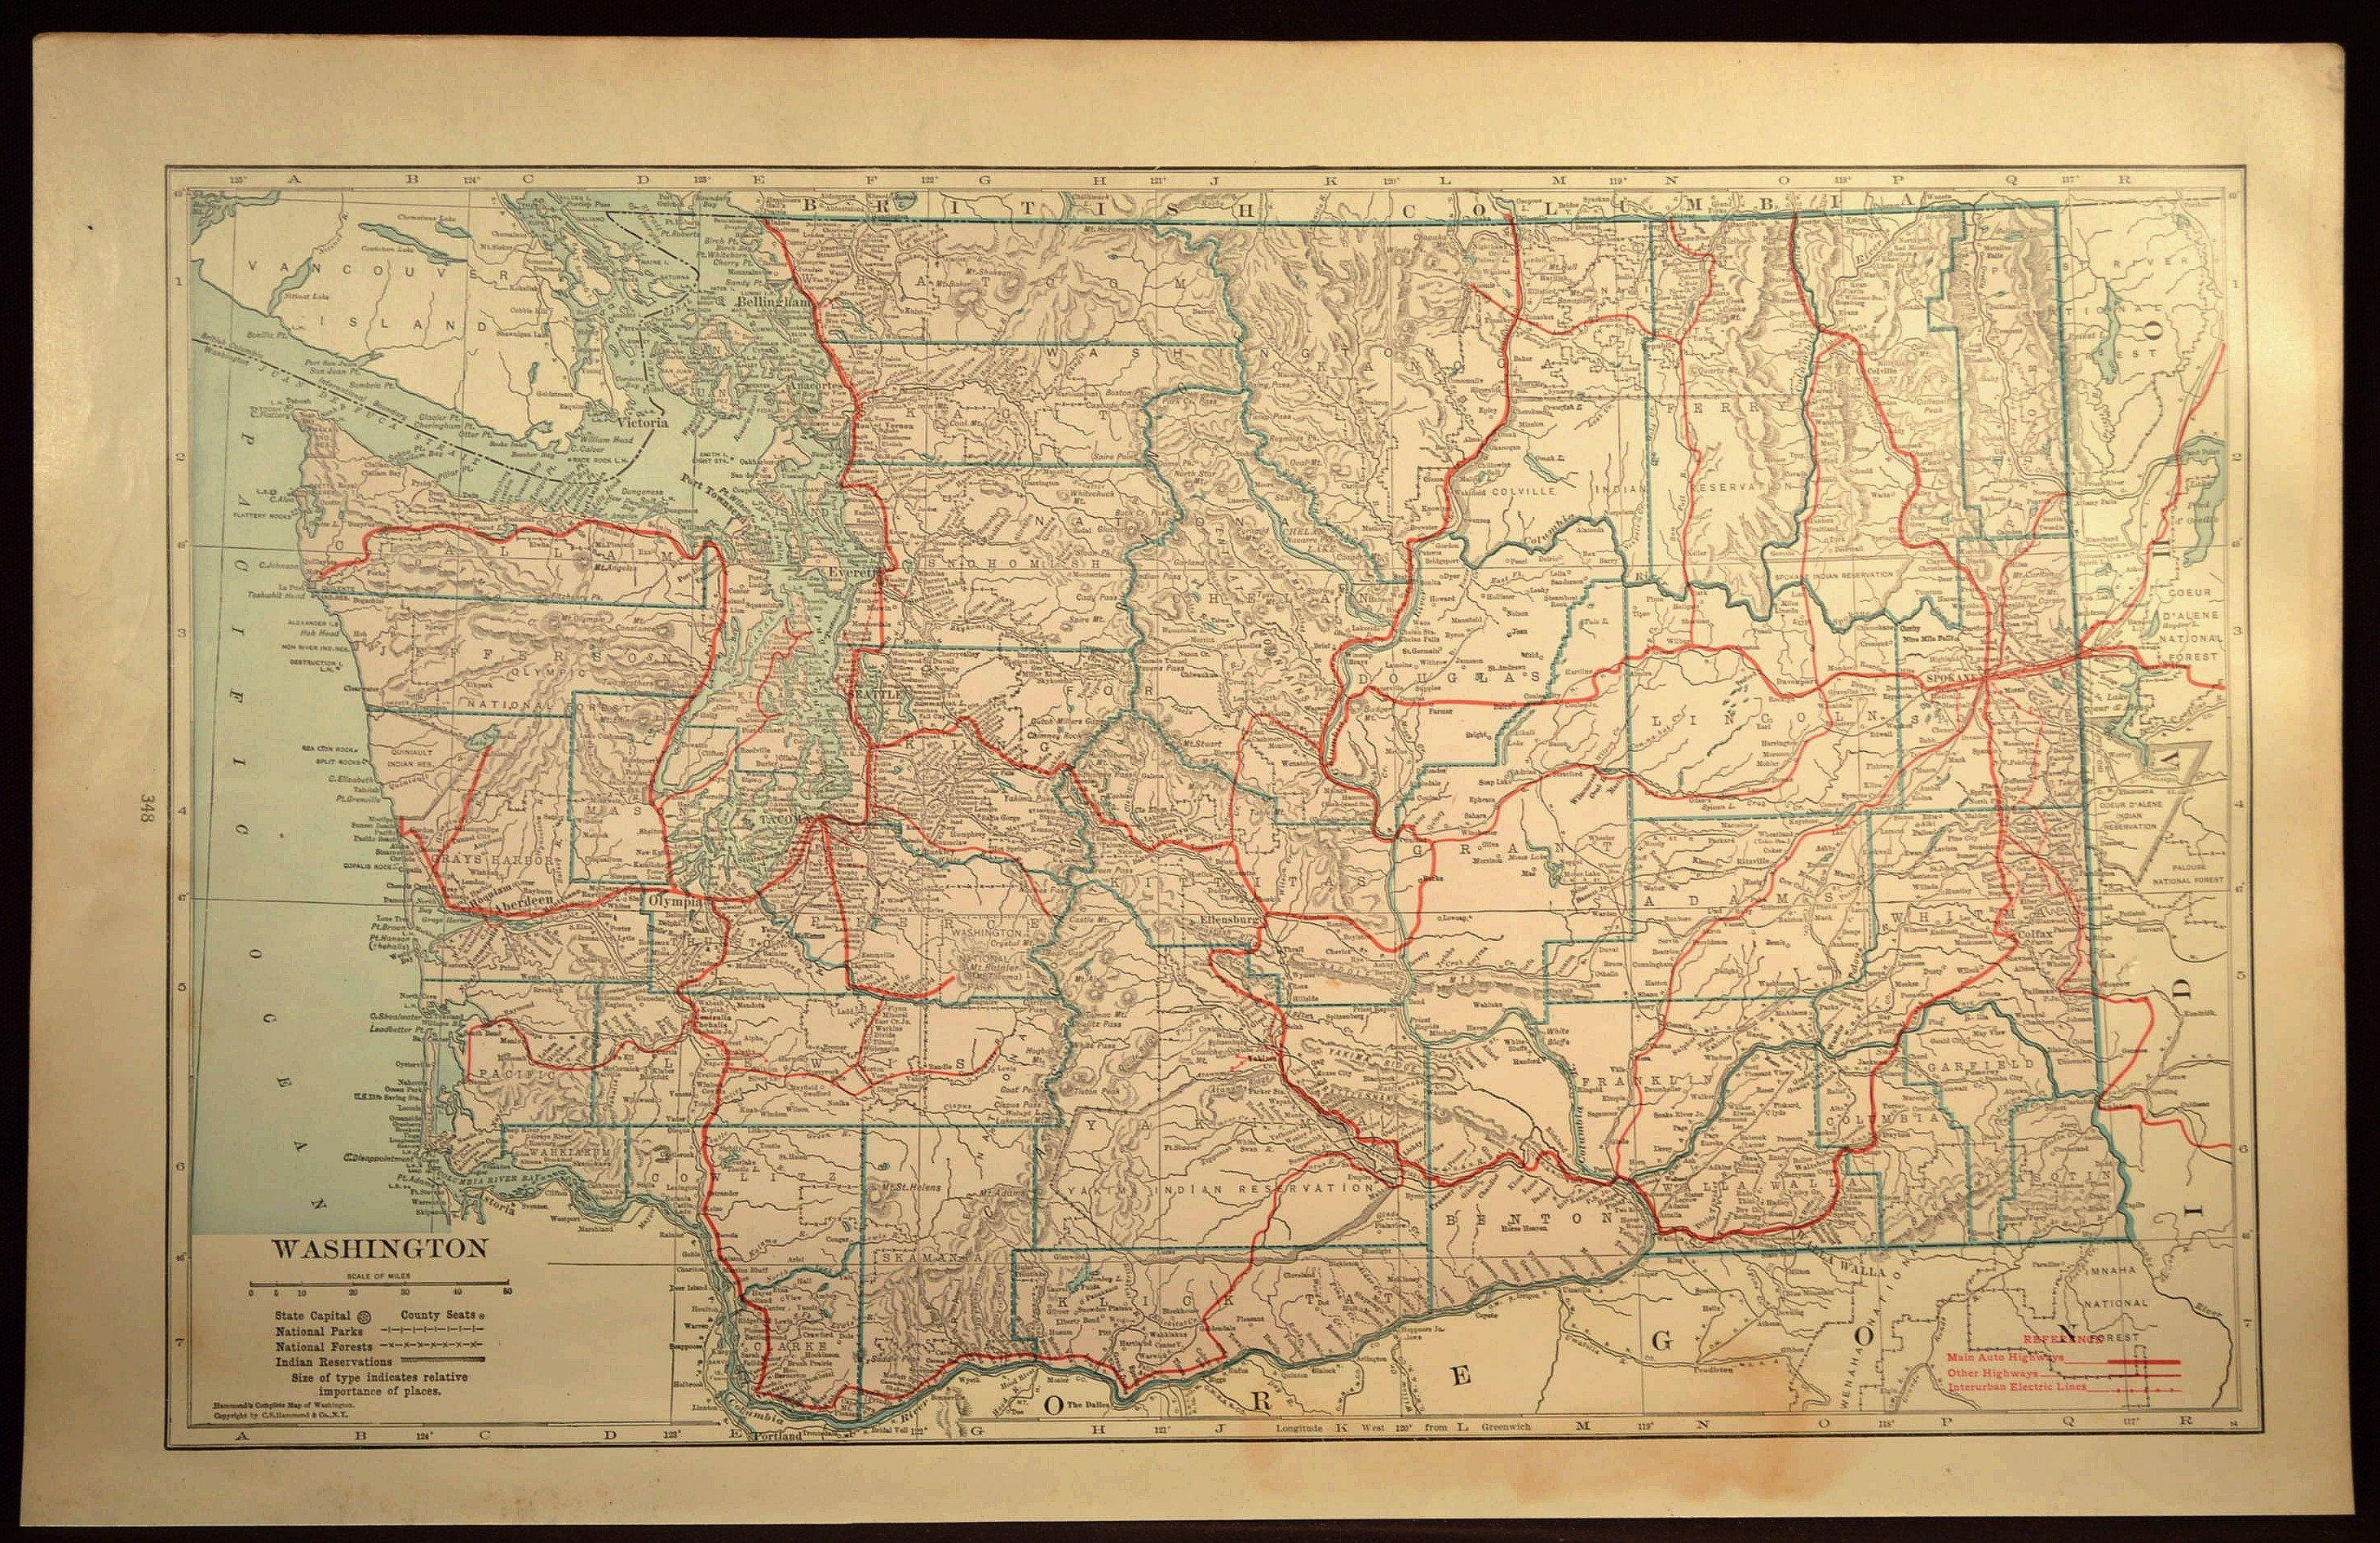 Washington Map Of Washington Road Map Large Wall Art Decor Highway